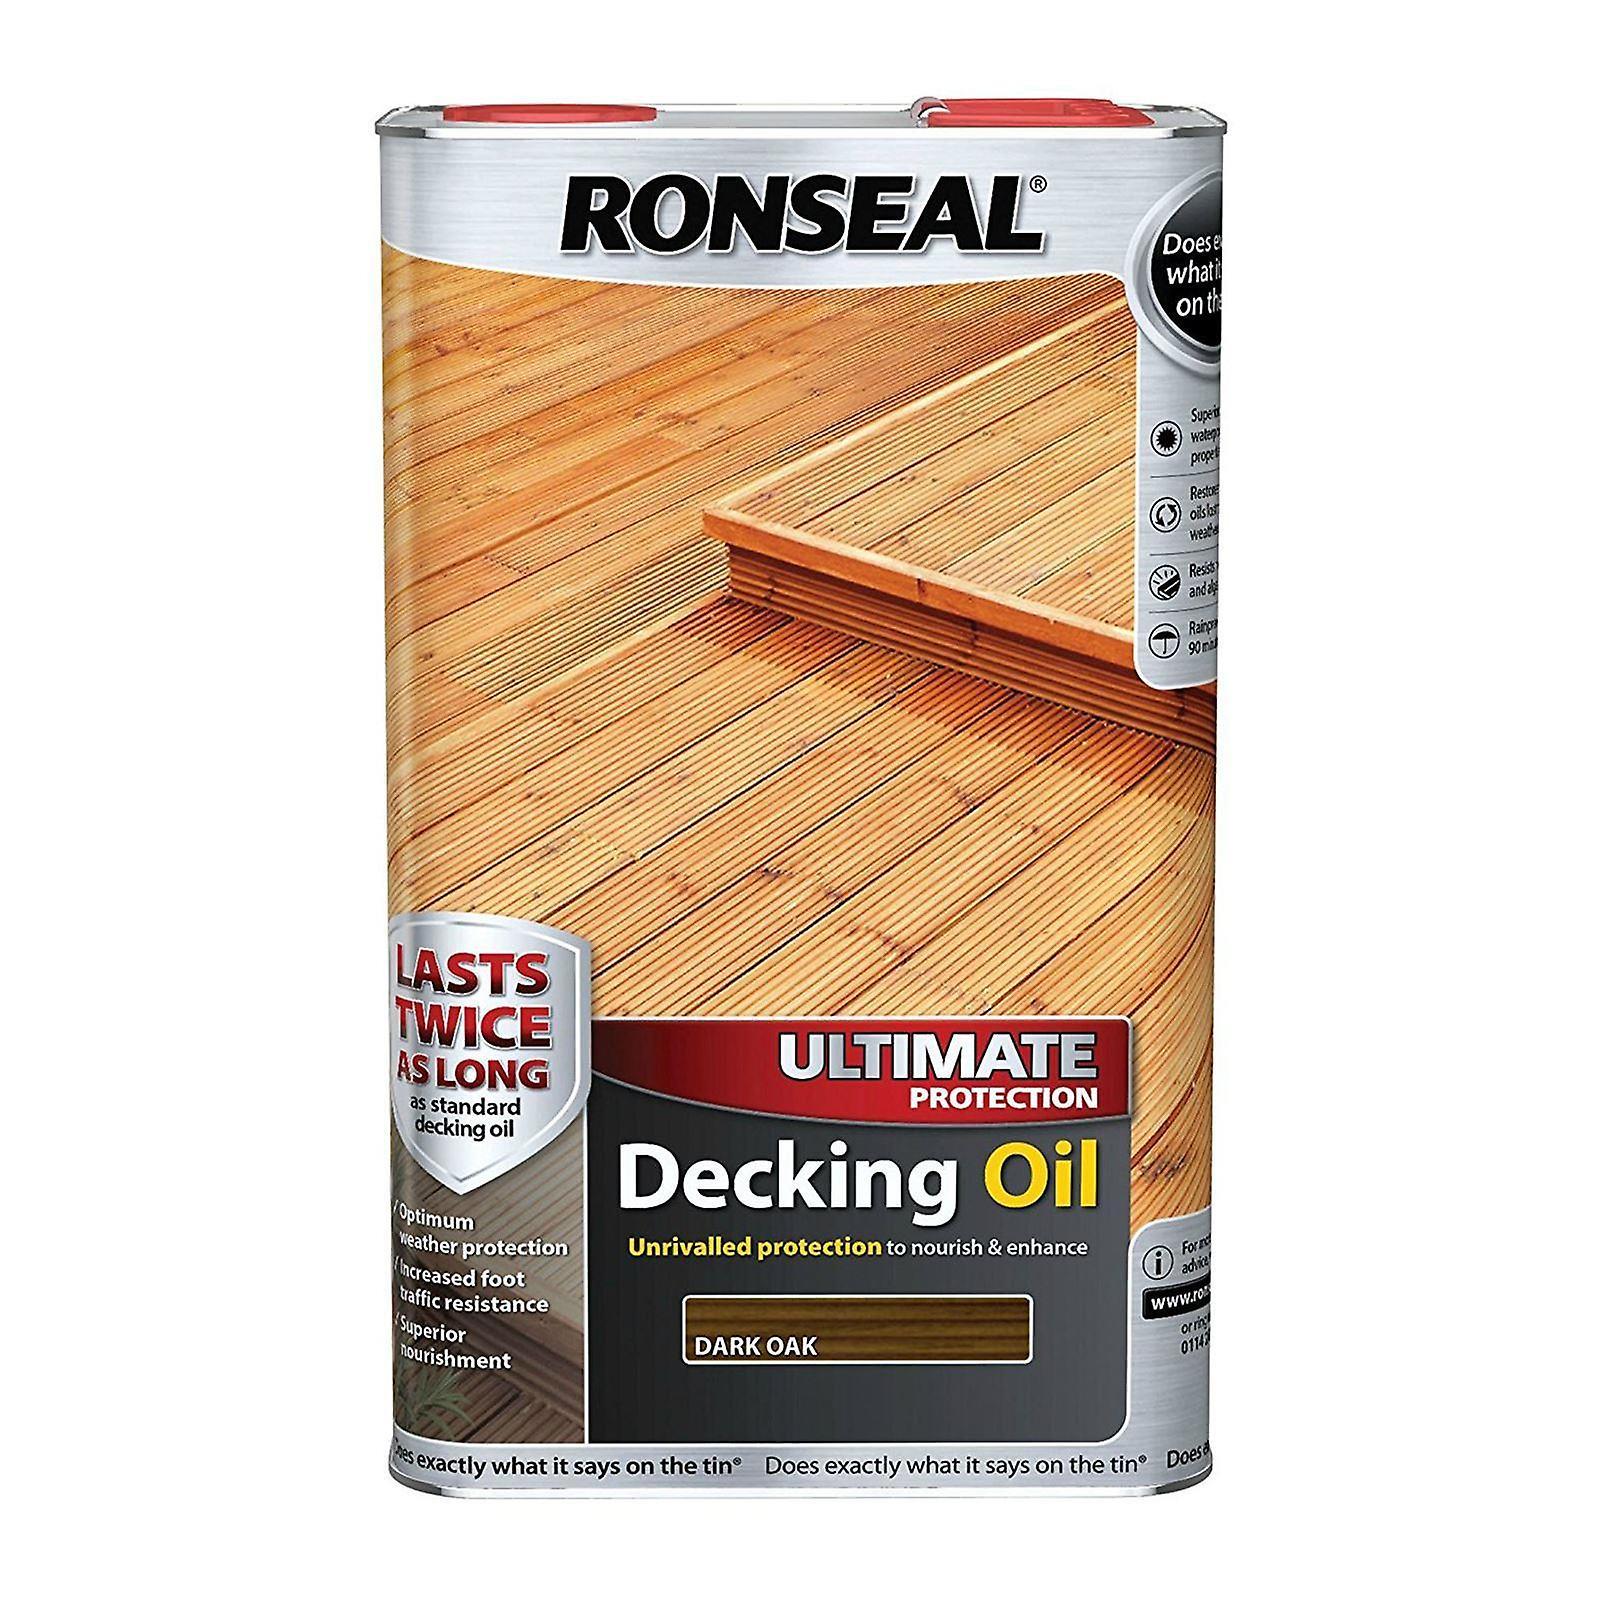 Ronseal Ultimate Protection Decking Oil 5 Litre - Dark Oak